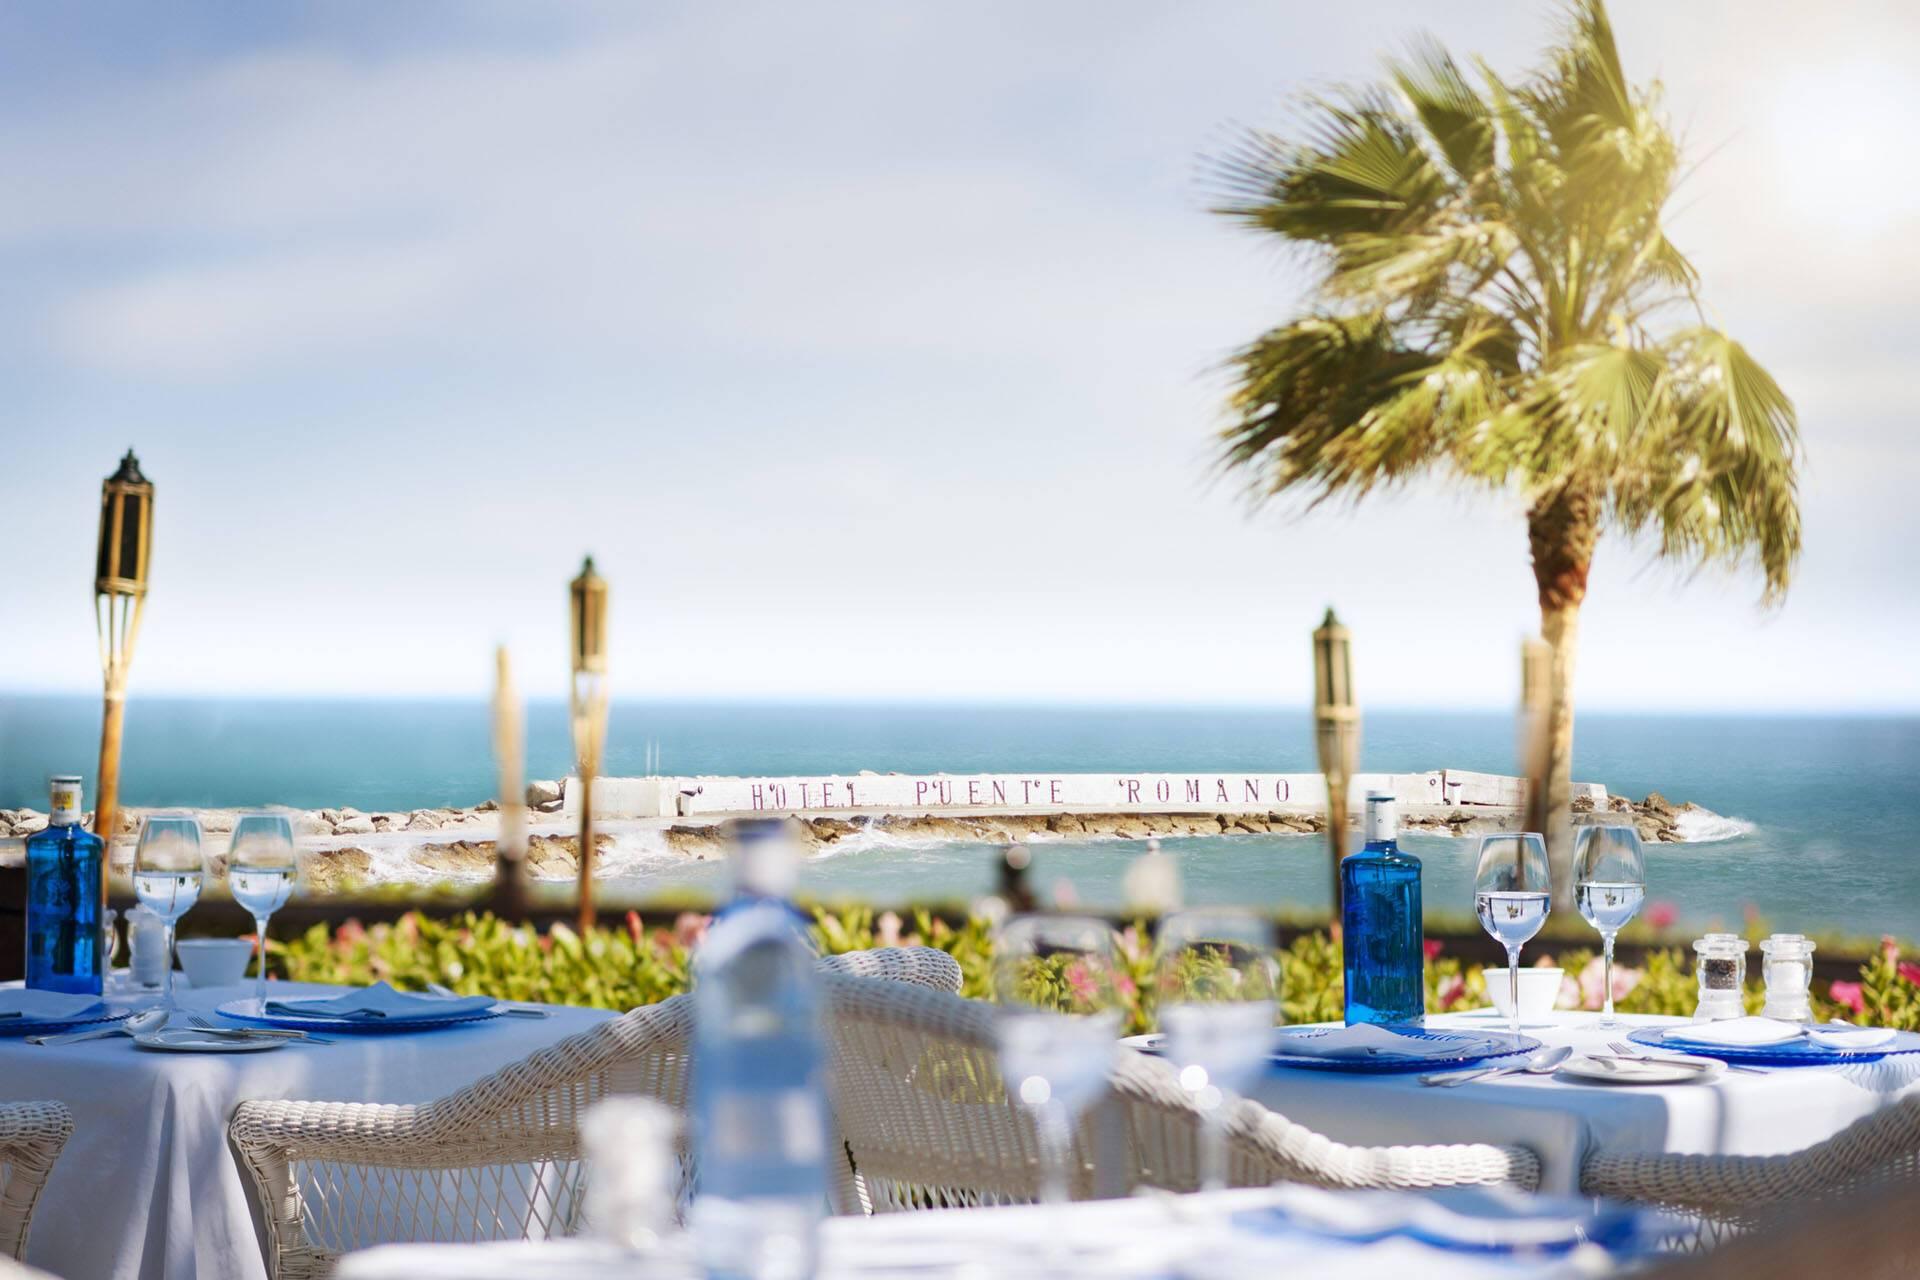 Puente Romano Marbella Andalousie Sea Grill